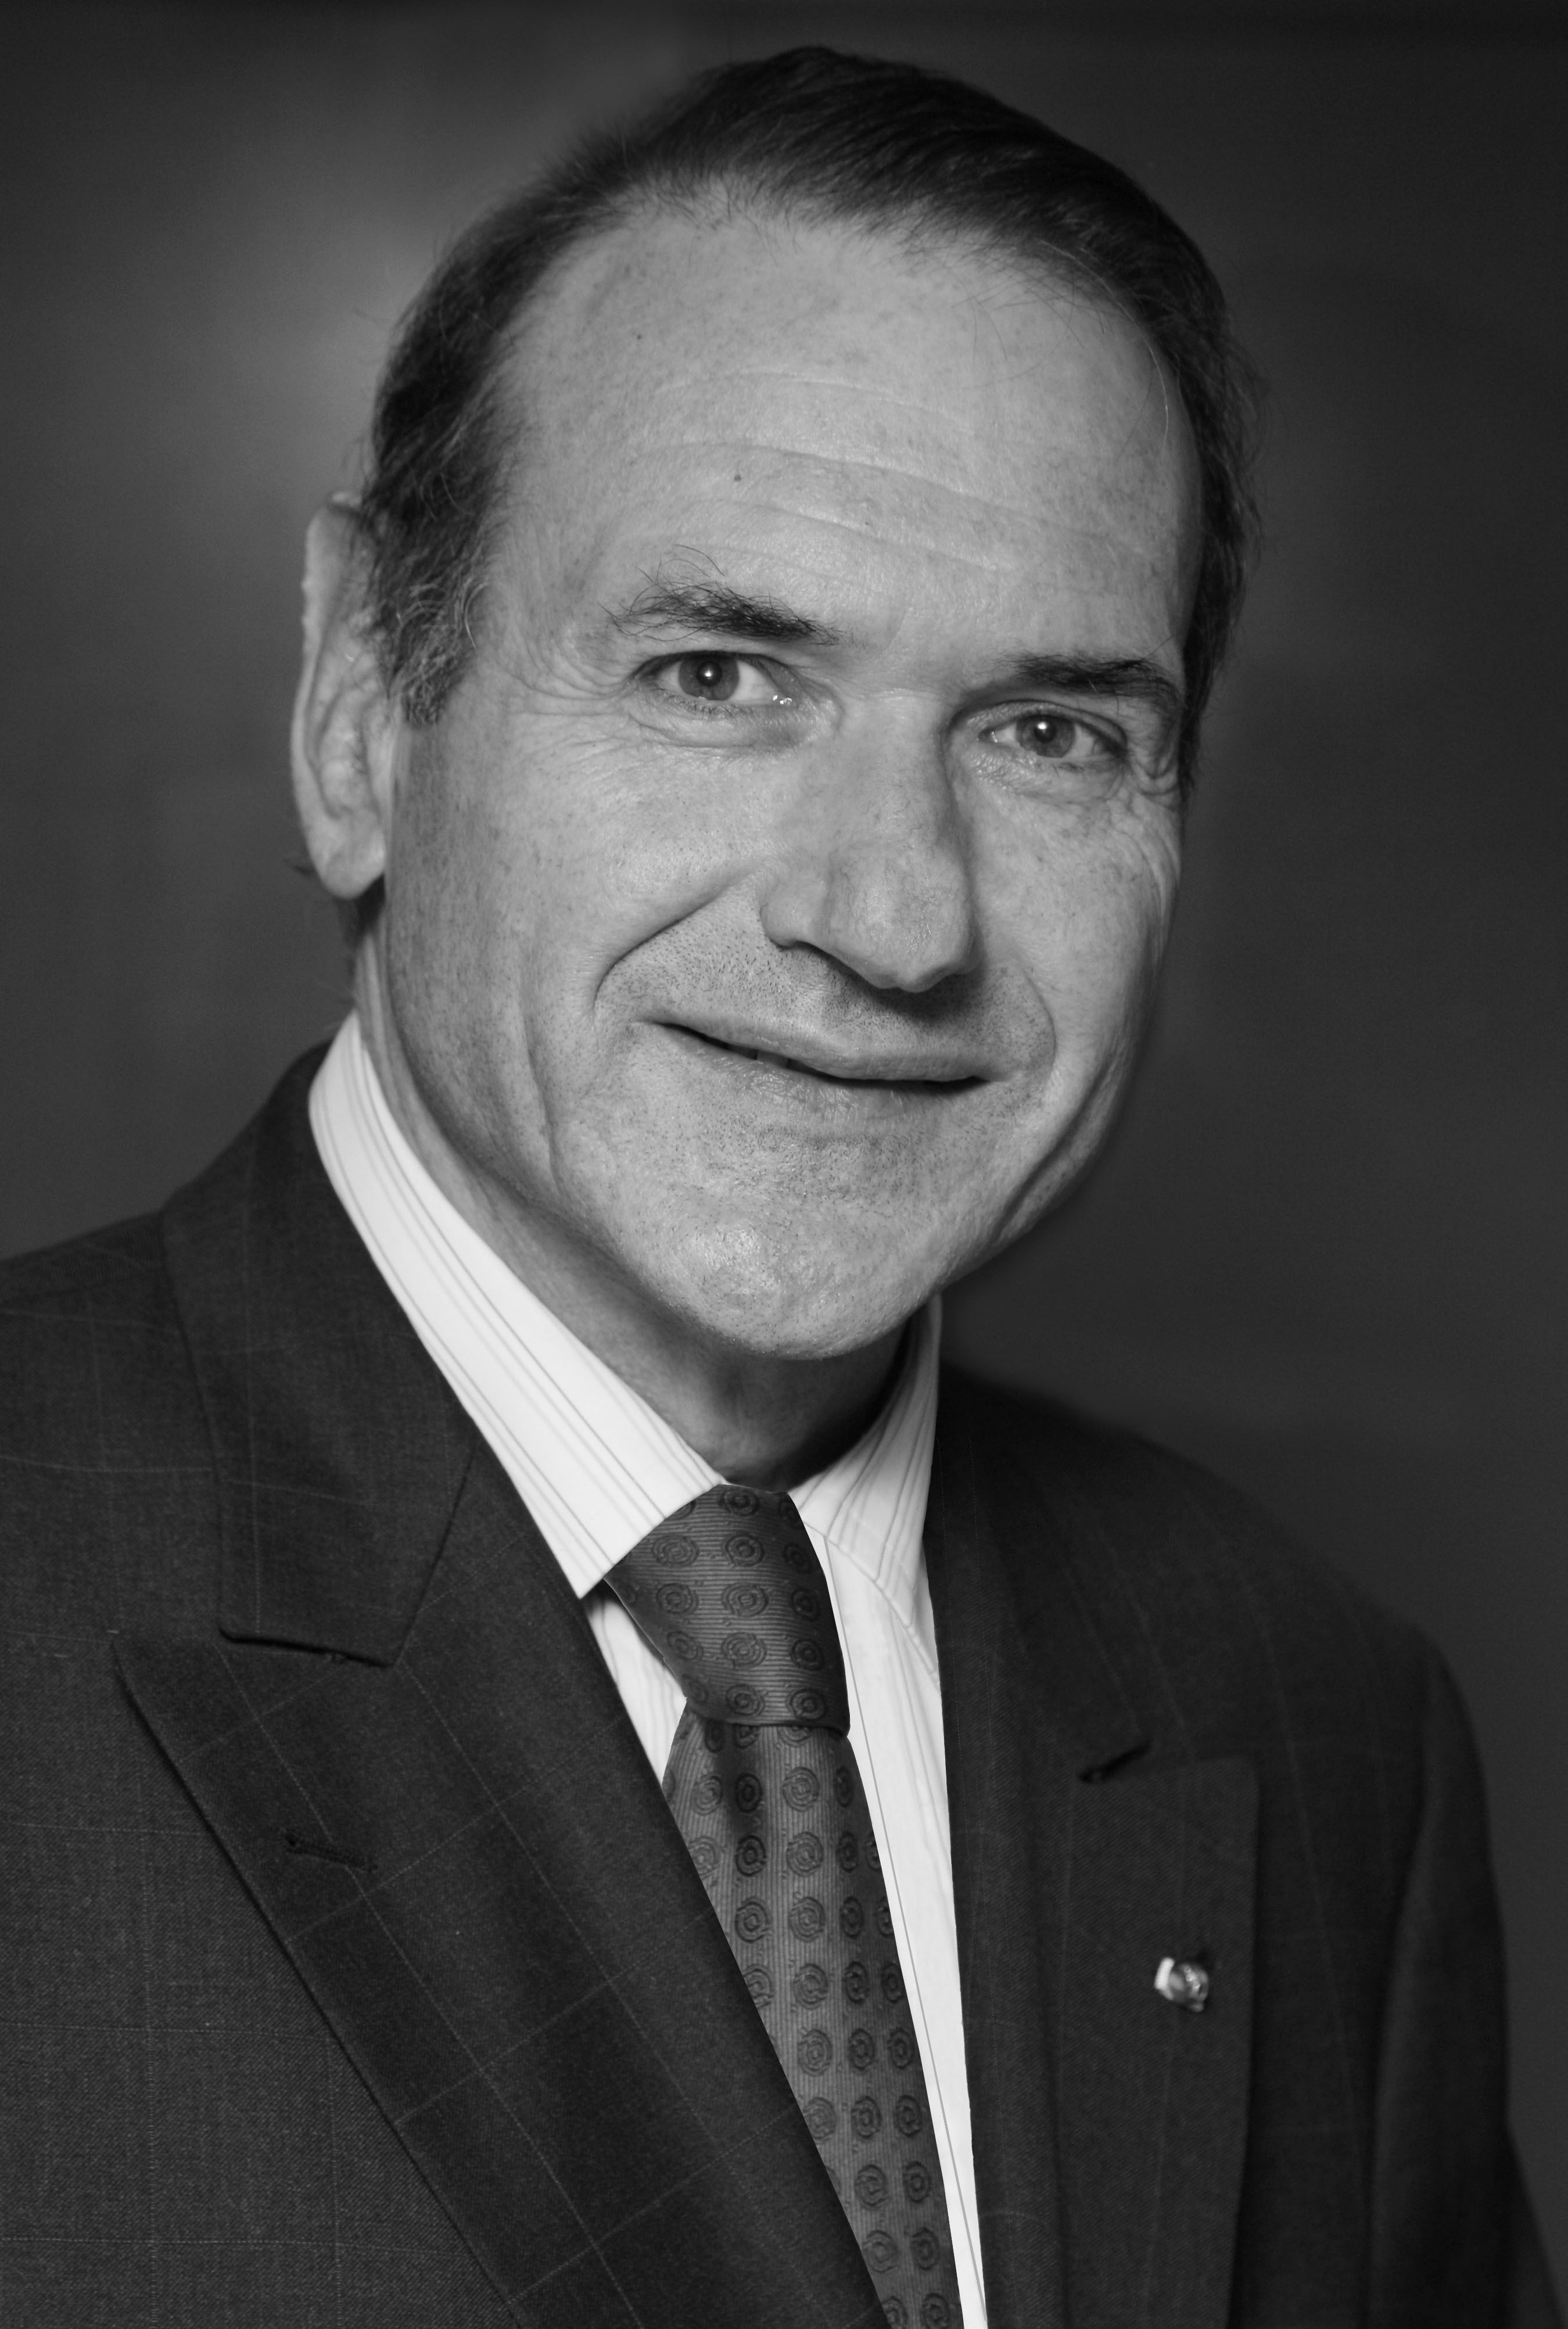 Henry Marty-Gauquié